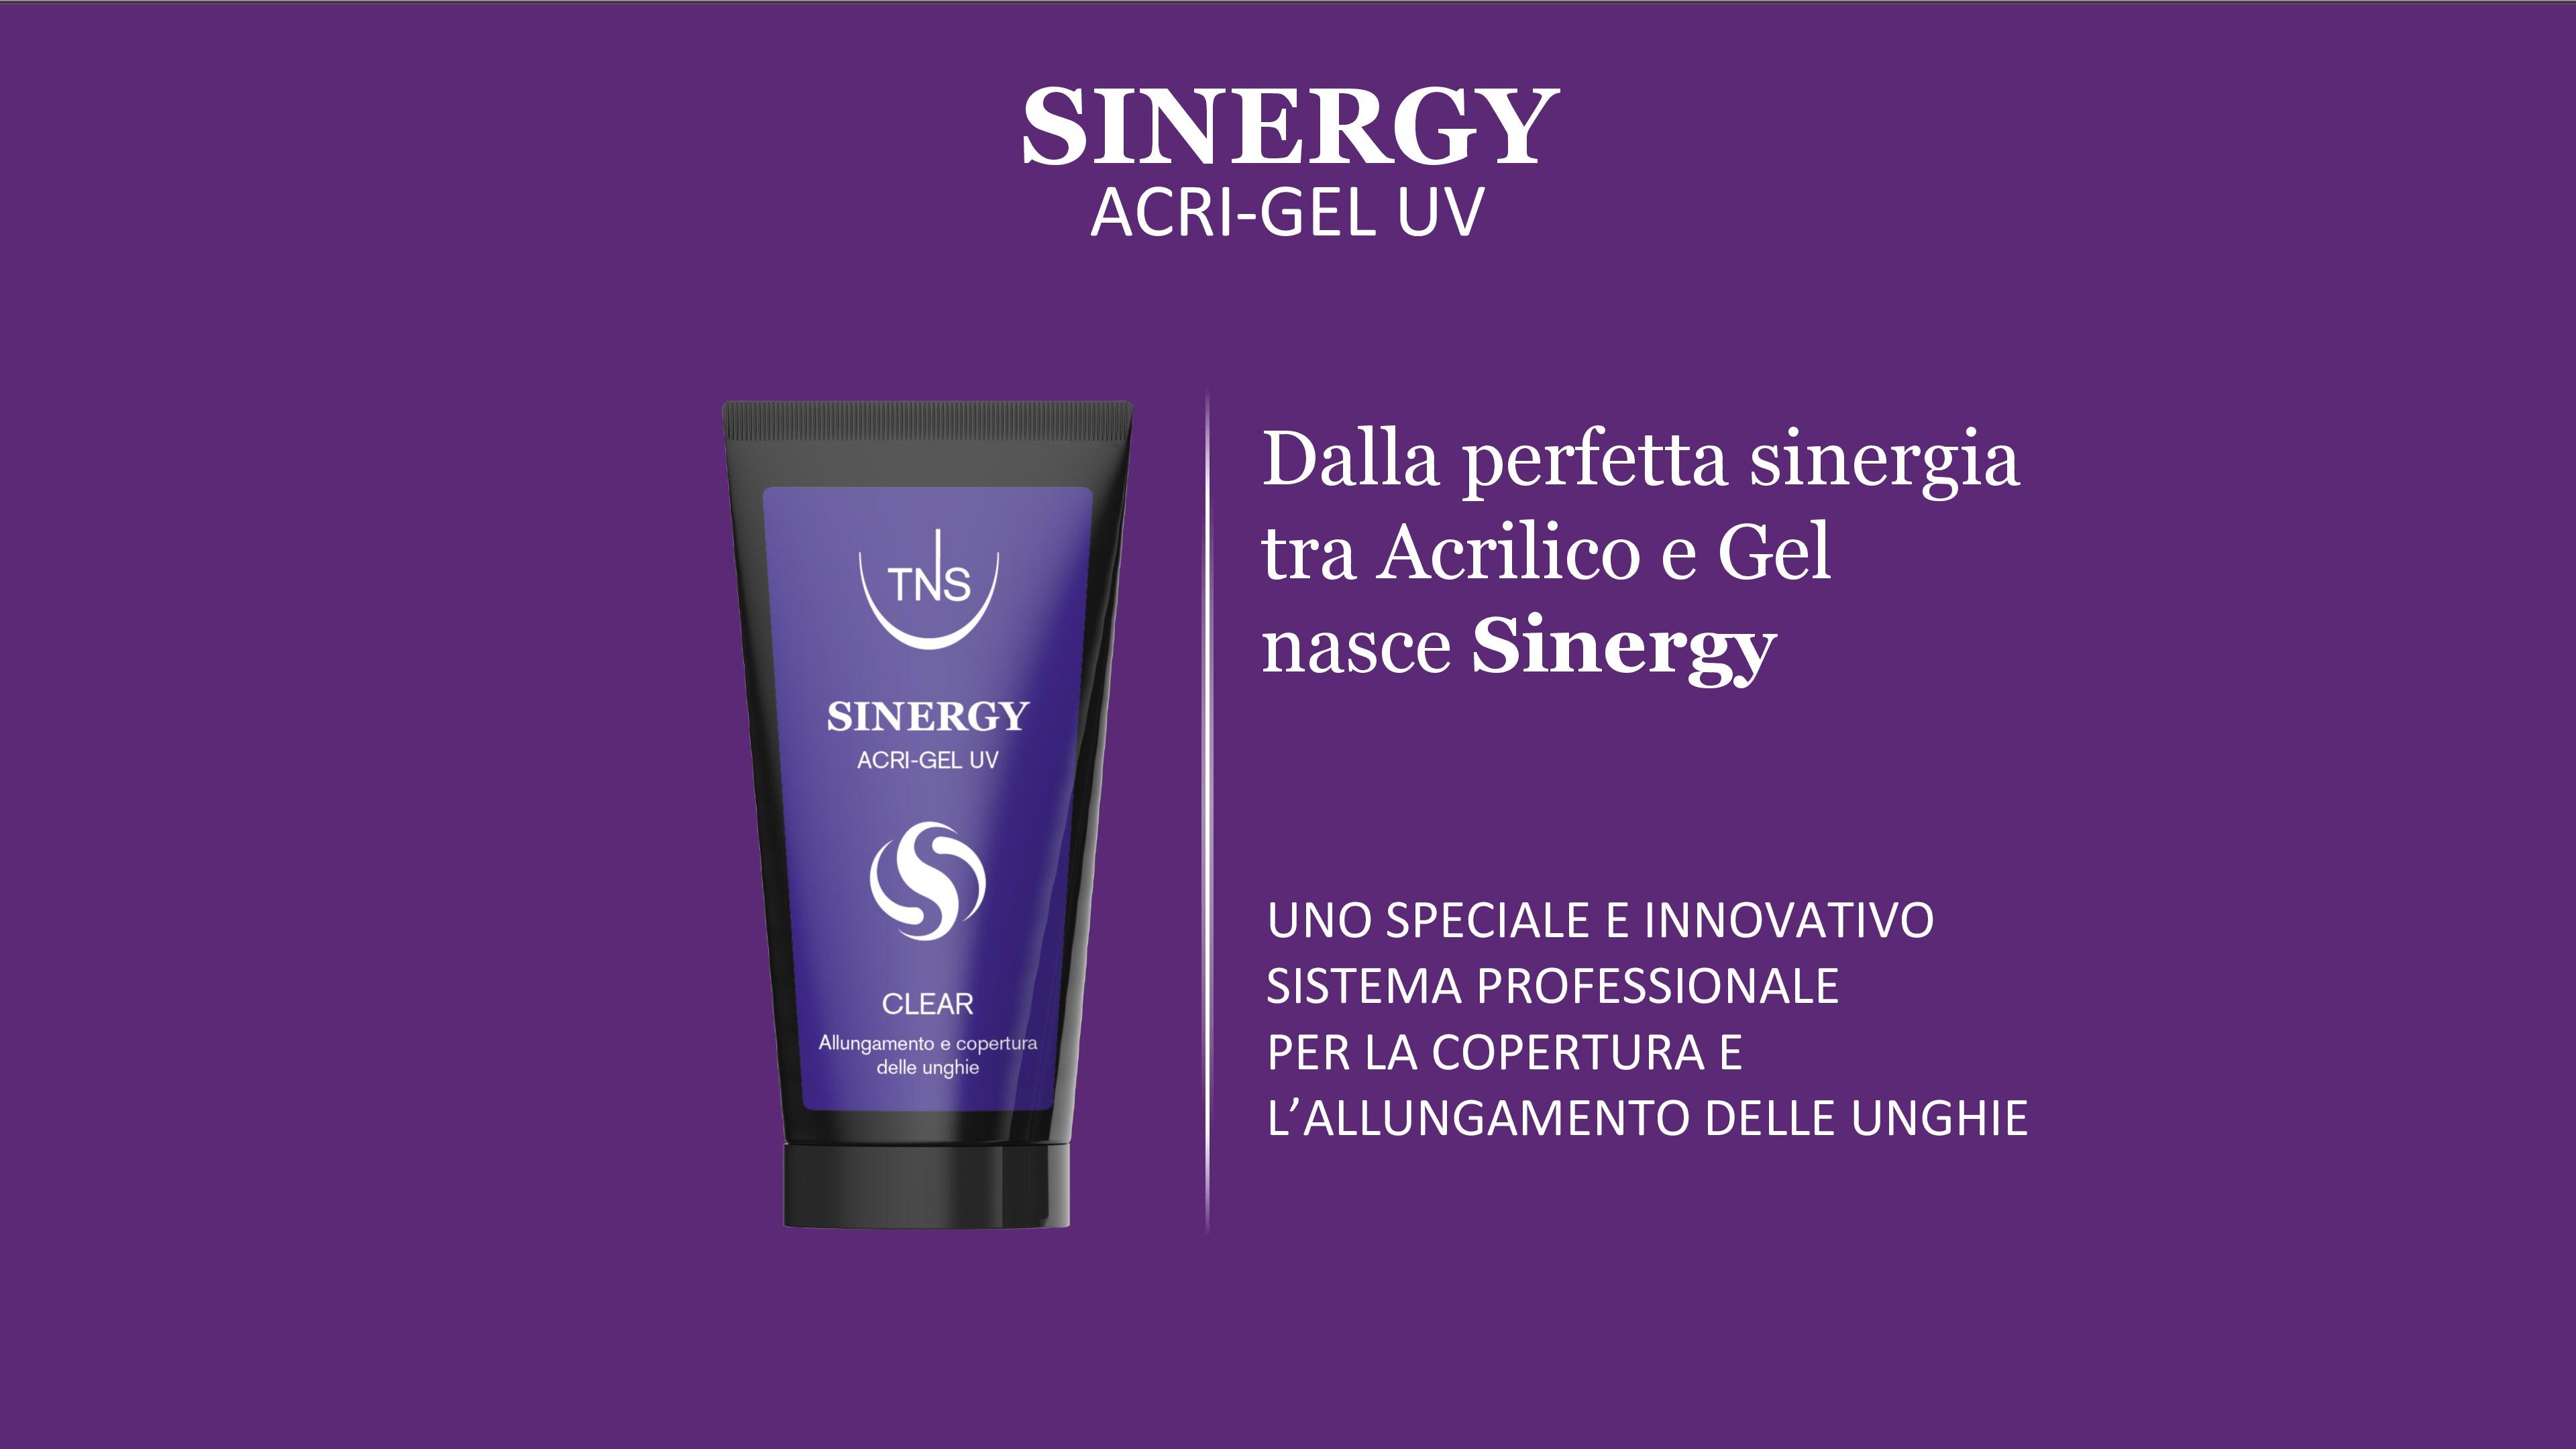 SINERGY Acri-gel uv - DRVgroup